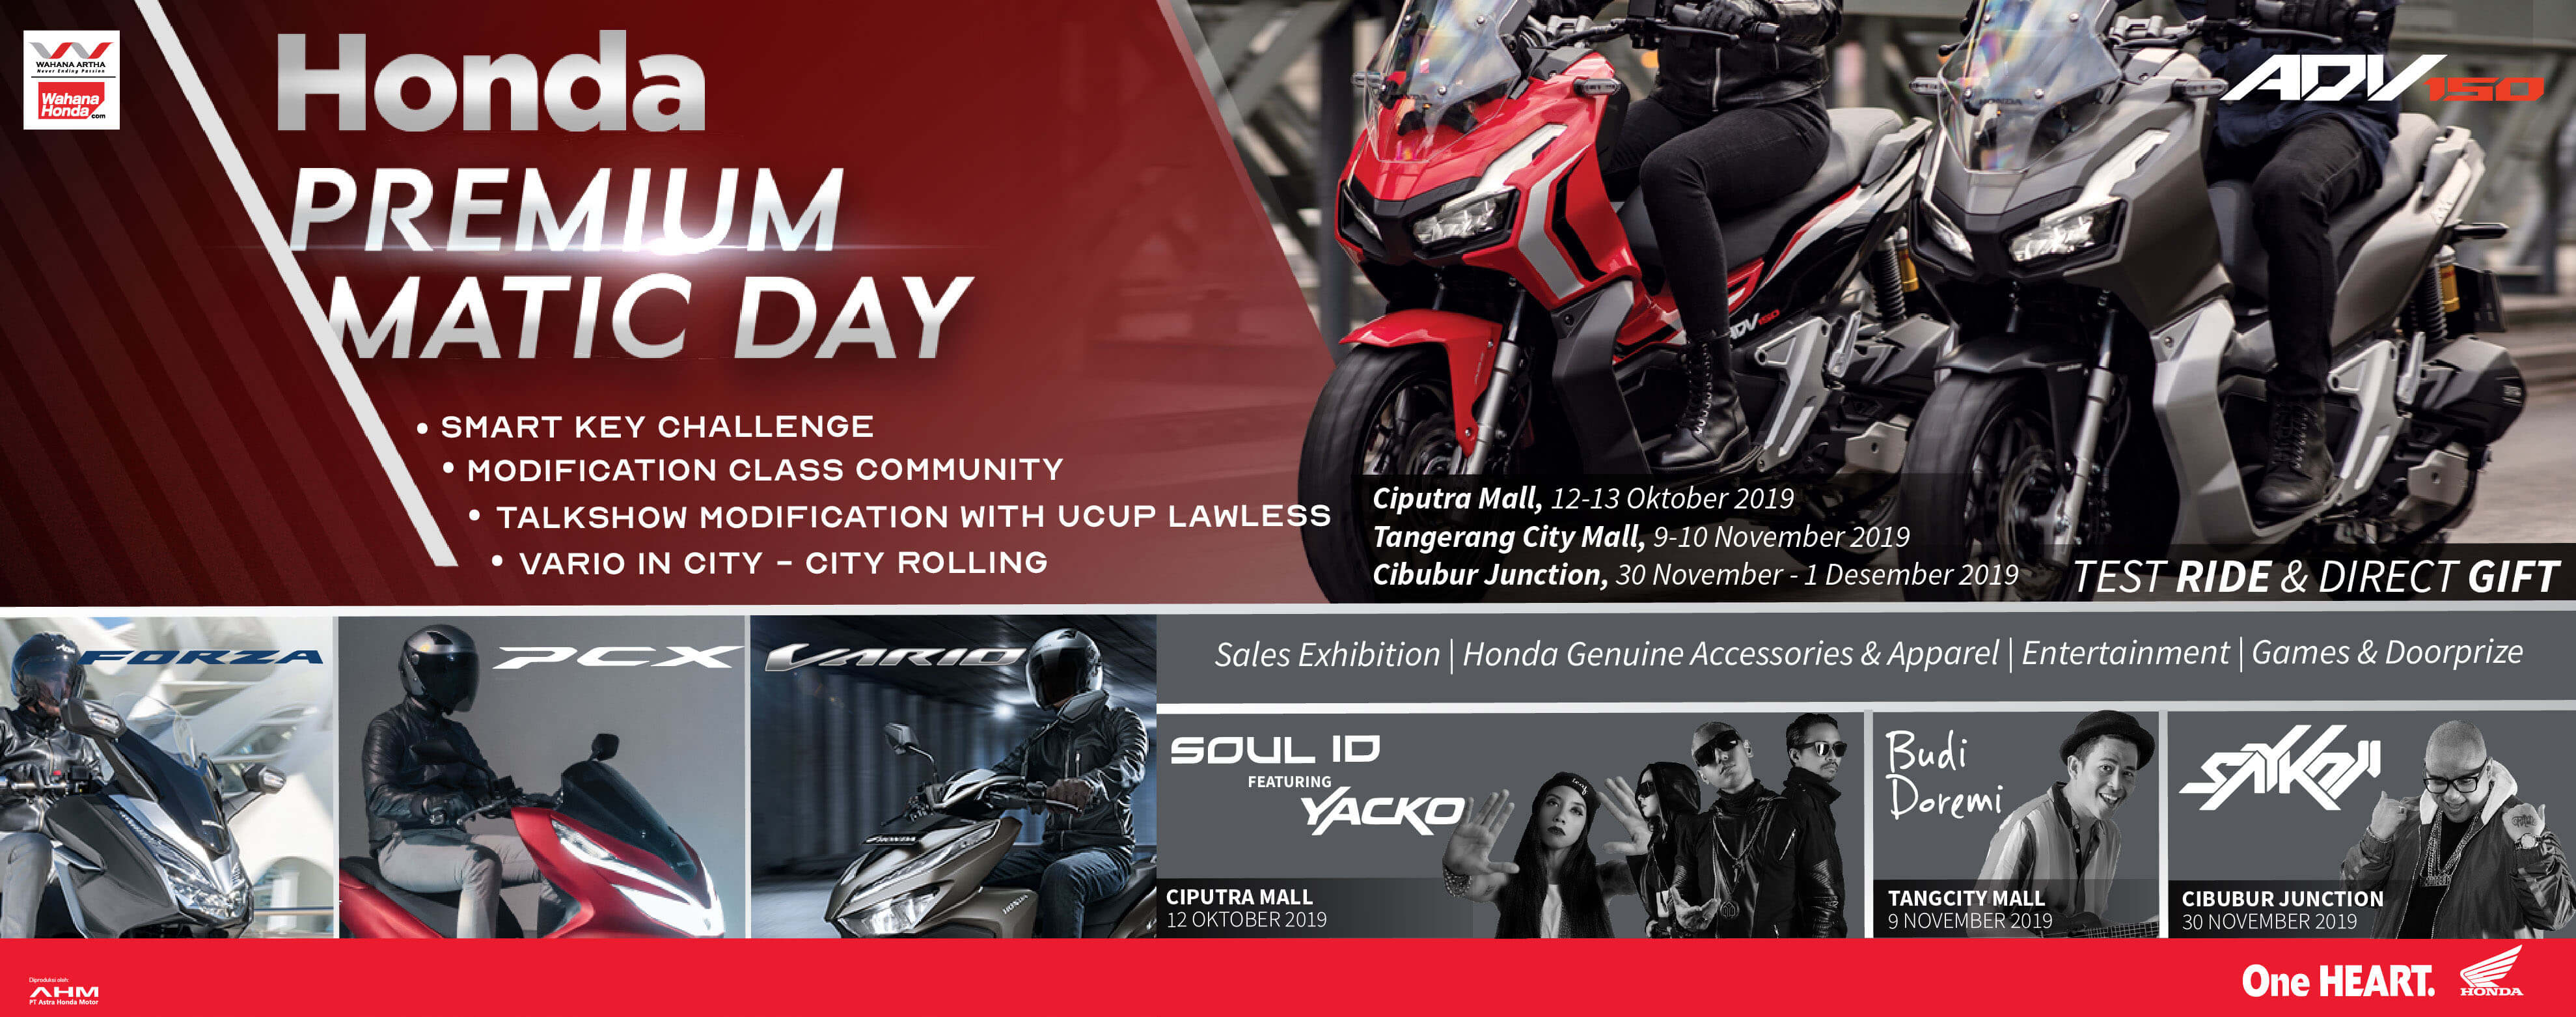 Honda Premium Matic Day 2019